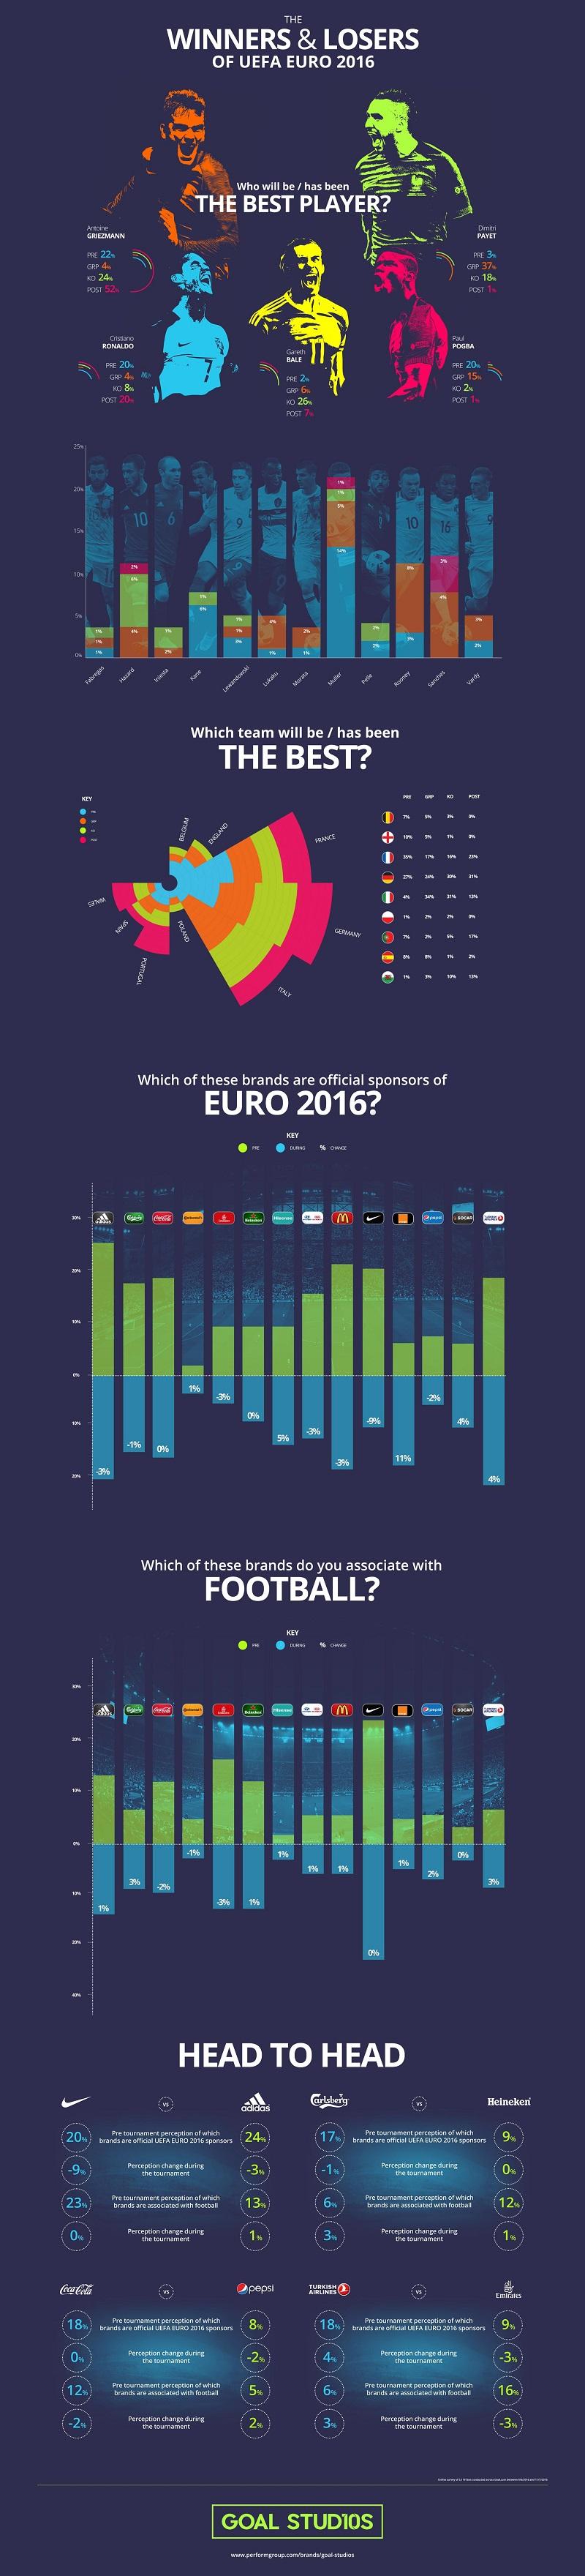 euro%20win%20lose.jpg